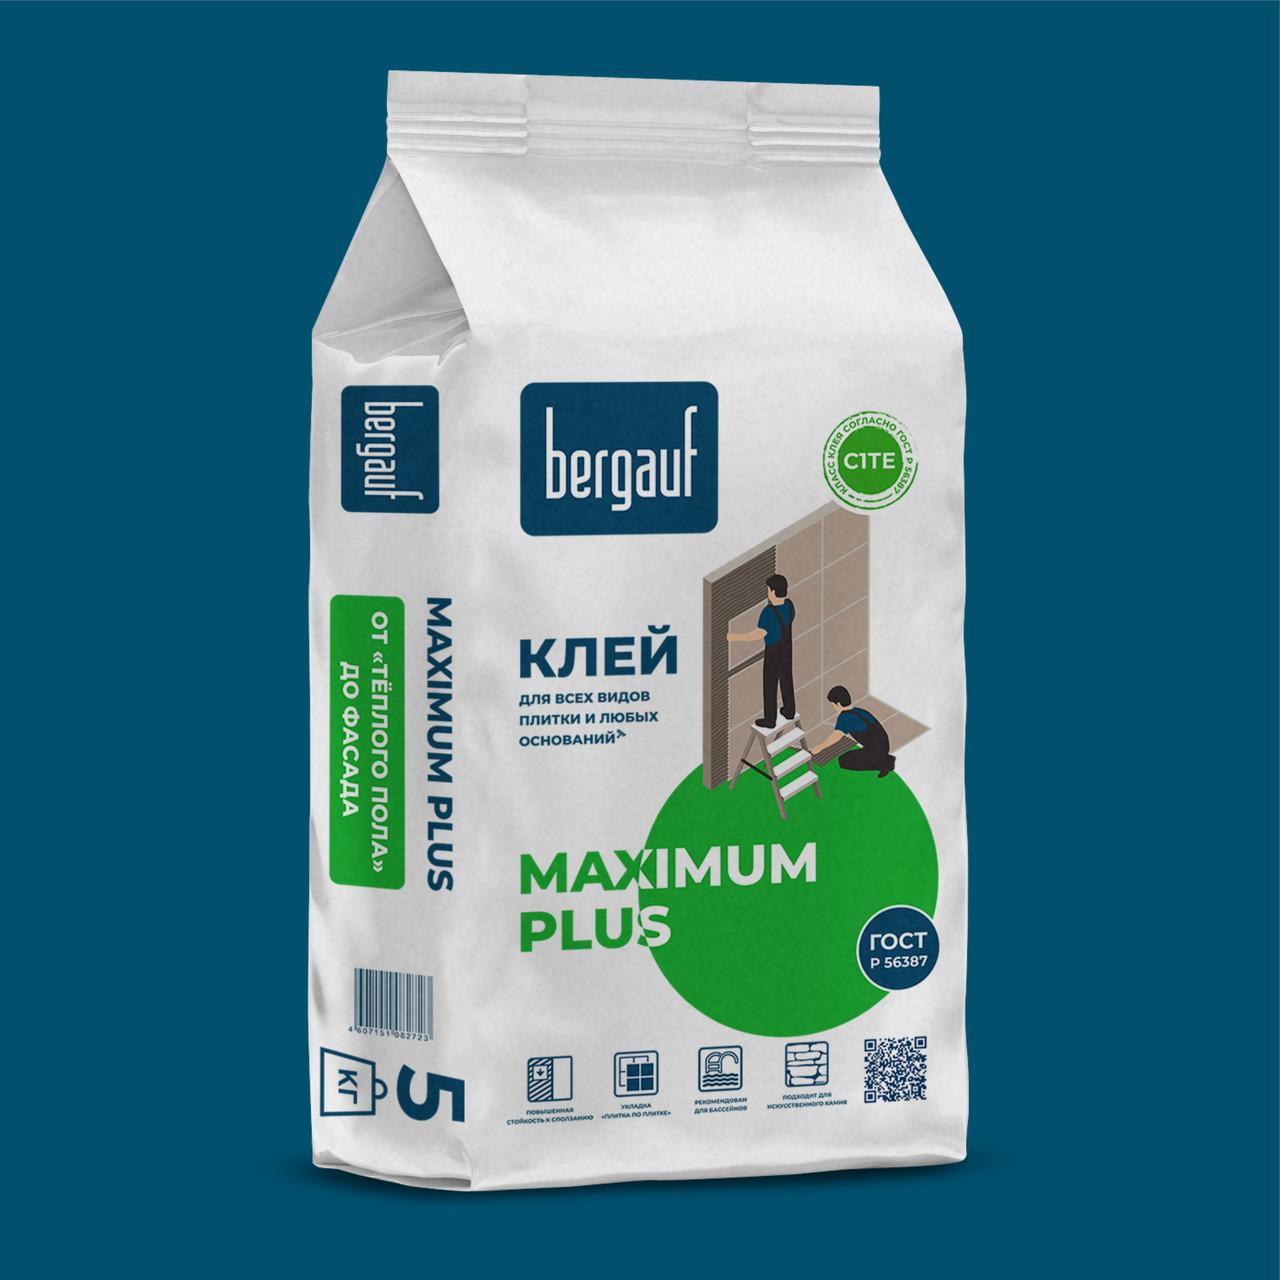 MAXIMUM PLUS, Клей для плитки, 5 кг, Bergauf